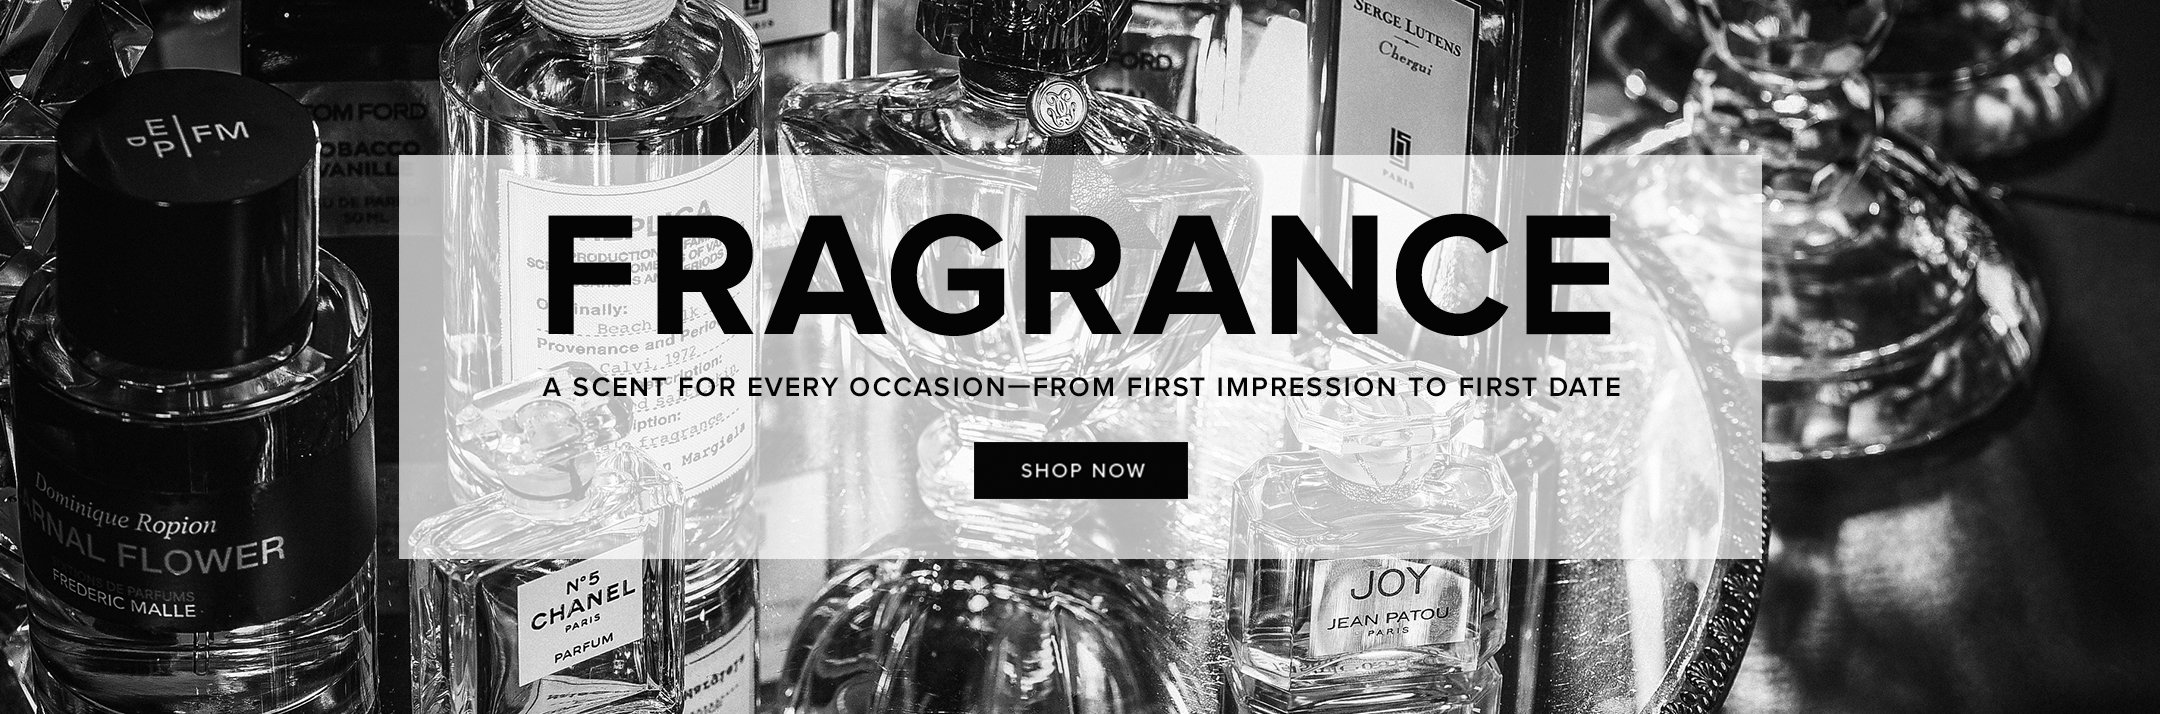 Fragrance-Interstitial.jpg